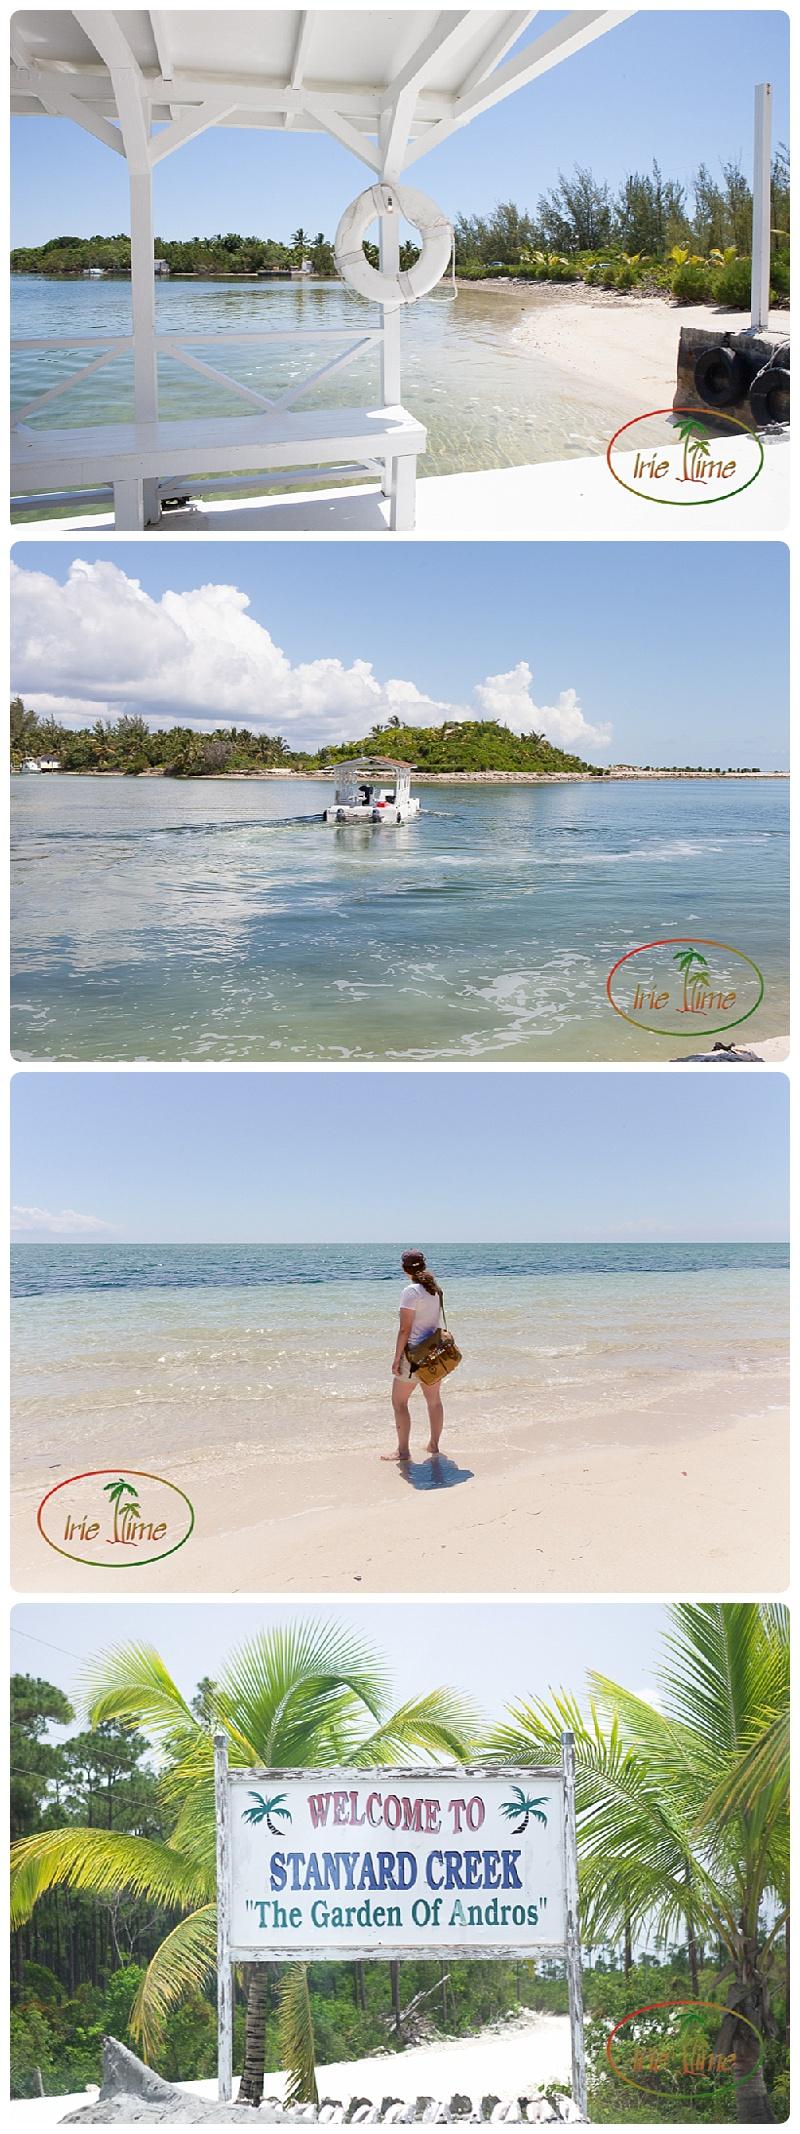 Walking Tour of Stanyard Creek, Andros Bahamas #bahamas #kamalamecay #iheartkamalame #honeymoon